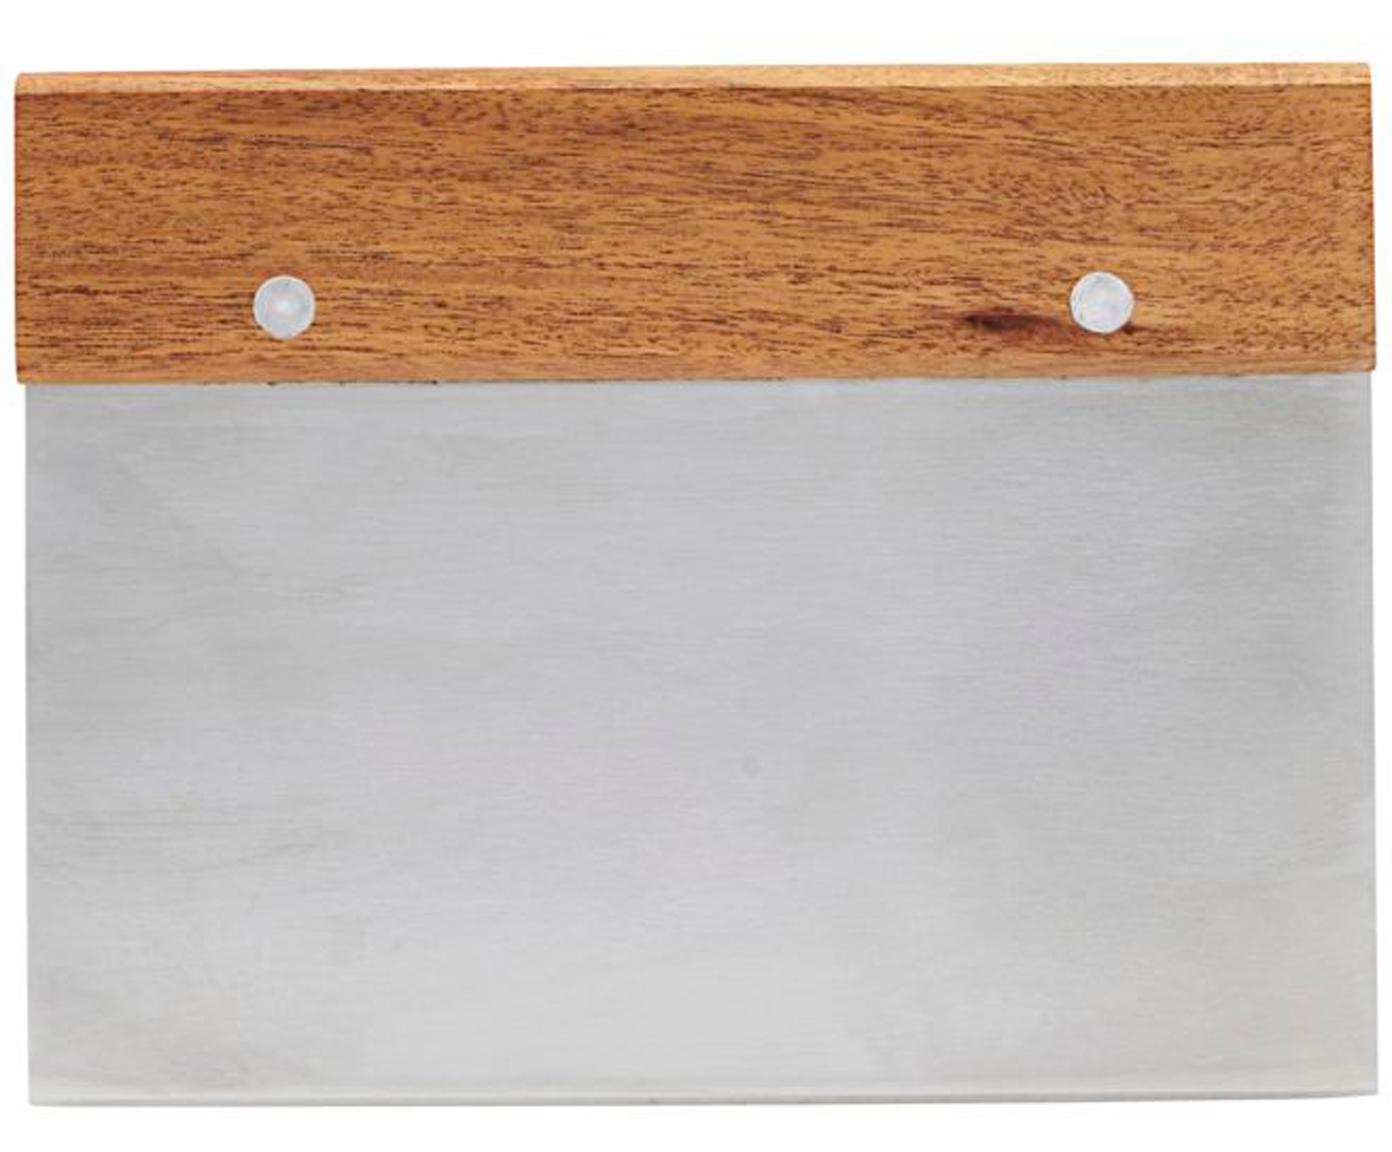 Tagliapasta Puka, Legno di acacia, acciaio inossidabile, Legno di acacia, acciaio inossidabile, Larg. 15 x Alt. 12 cm